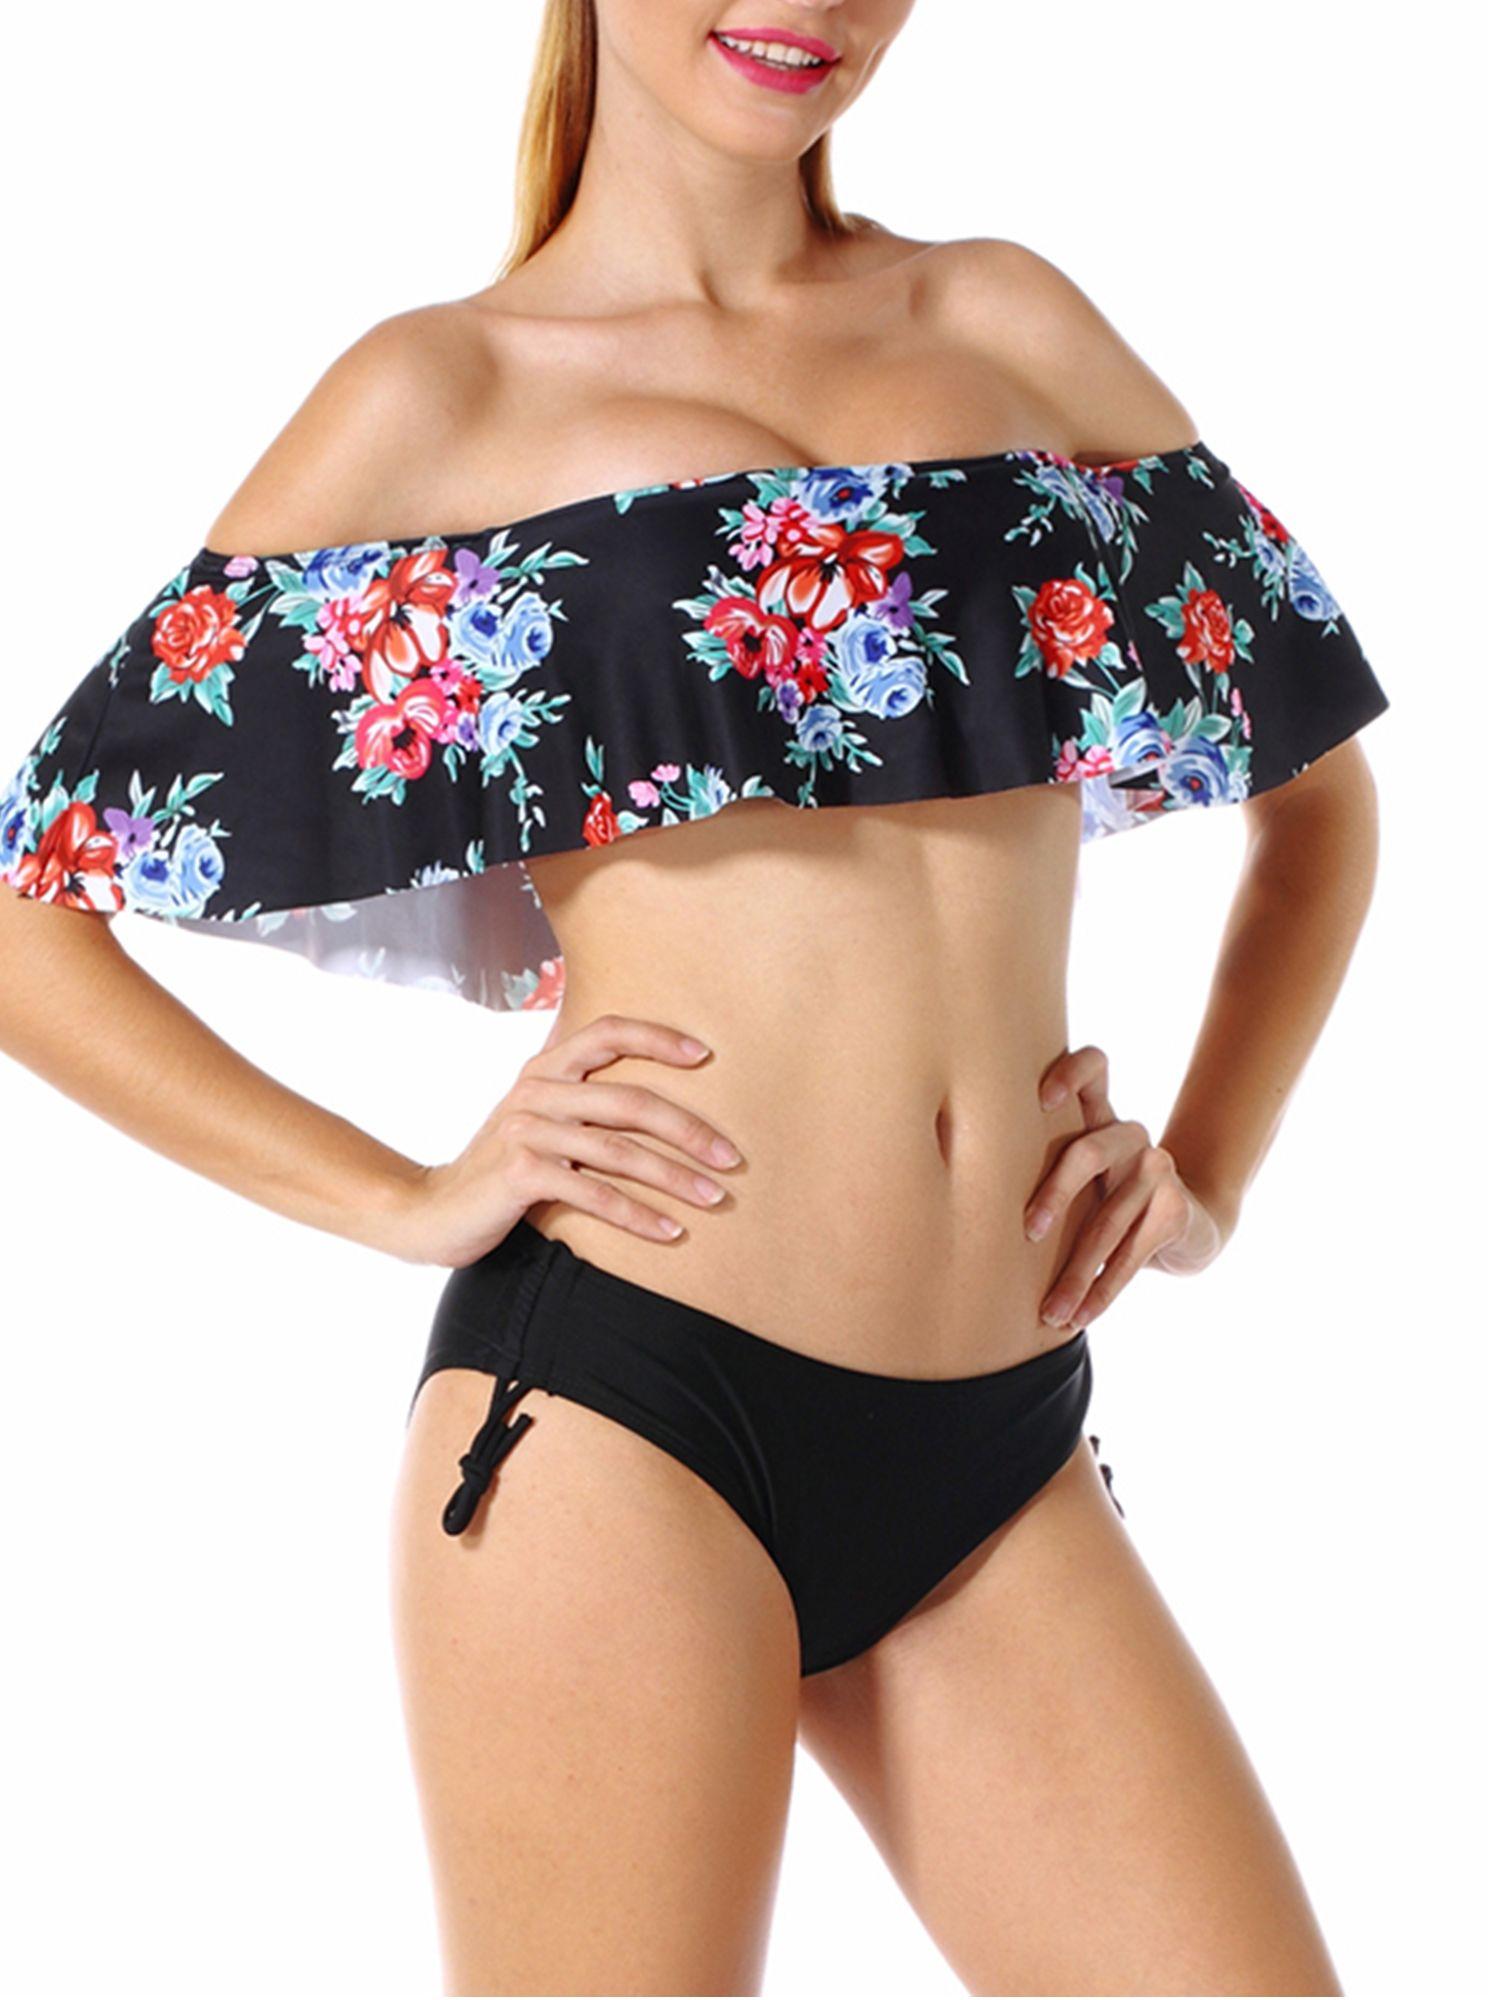 12cdbb83a435a SAYFUT Women Off-Shoulder Ruffle Bikini Set Two-piece Padded Swimsuit  Swimwear Bathing Suit Black White S-XL Bikini